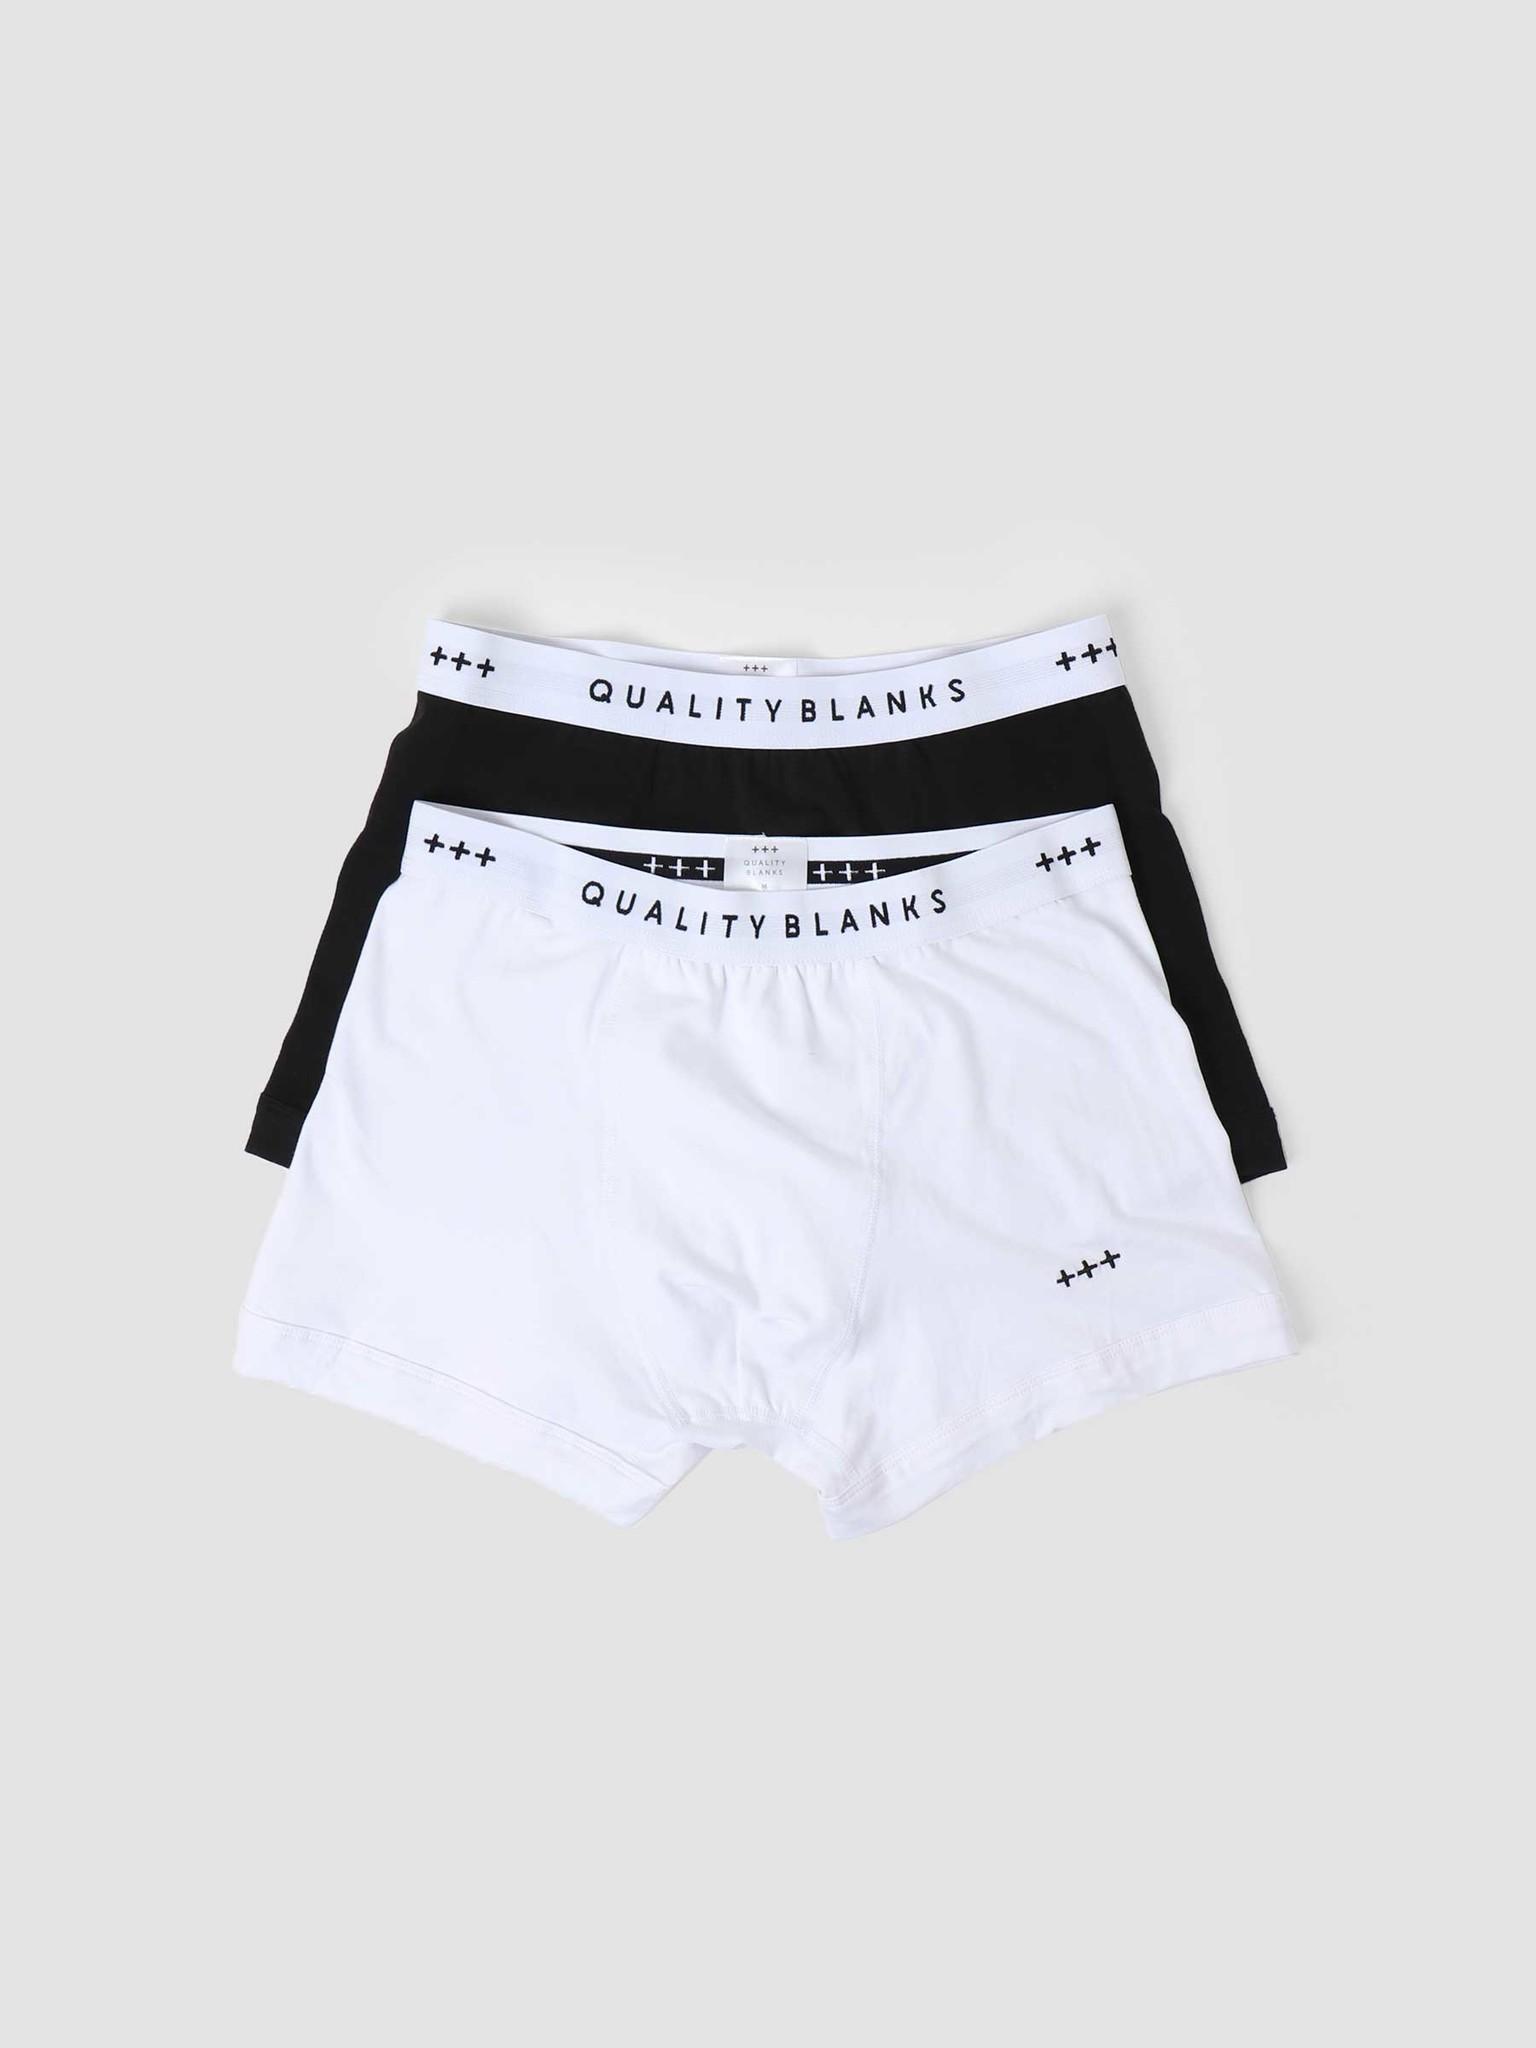 Quality Blanks Quality Blanks QB04 2-pack Trunks Black White